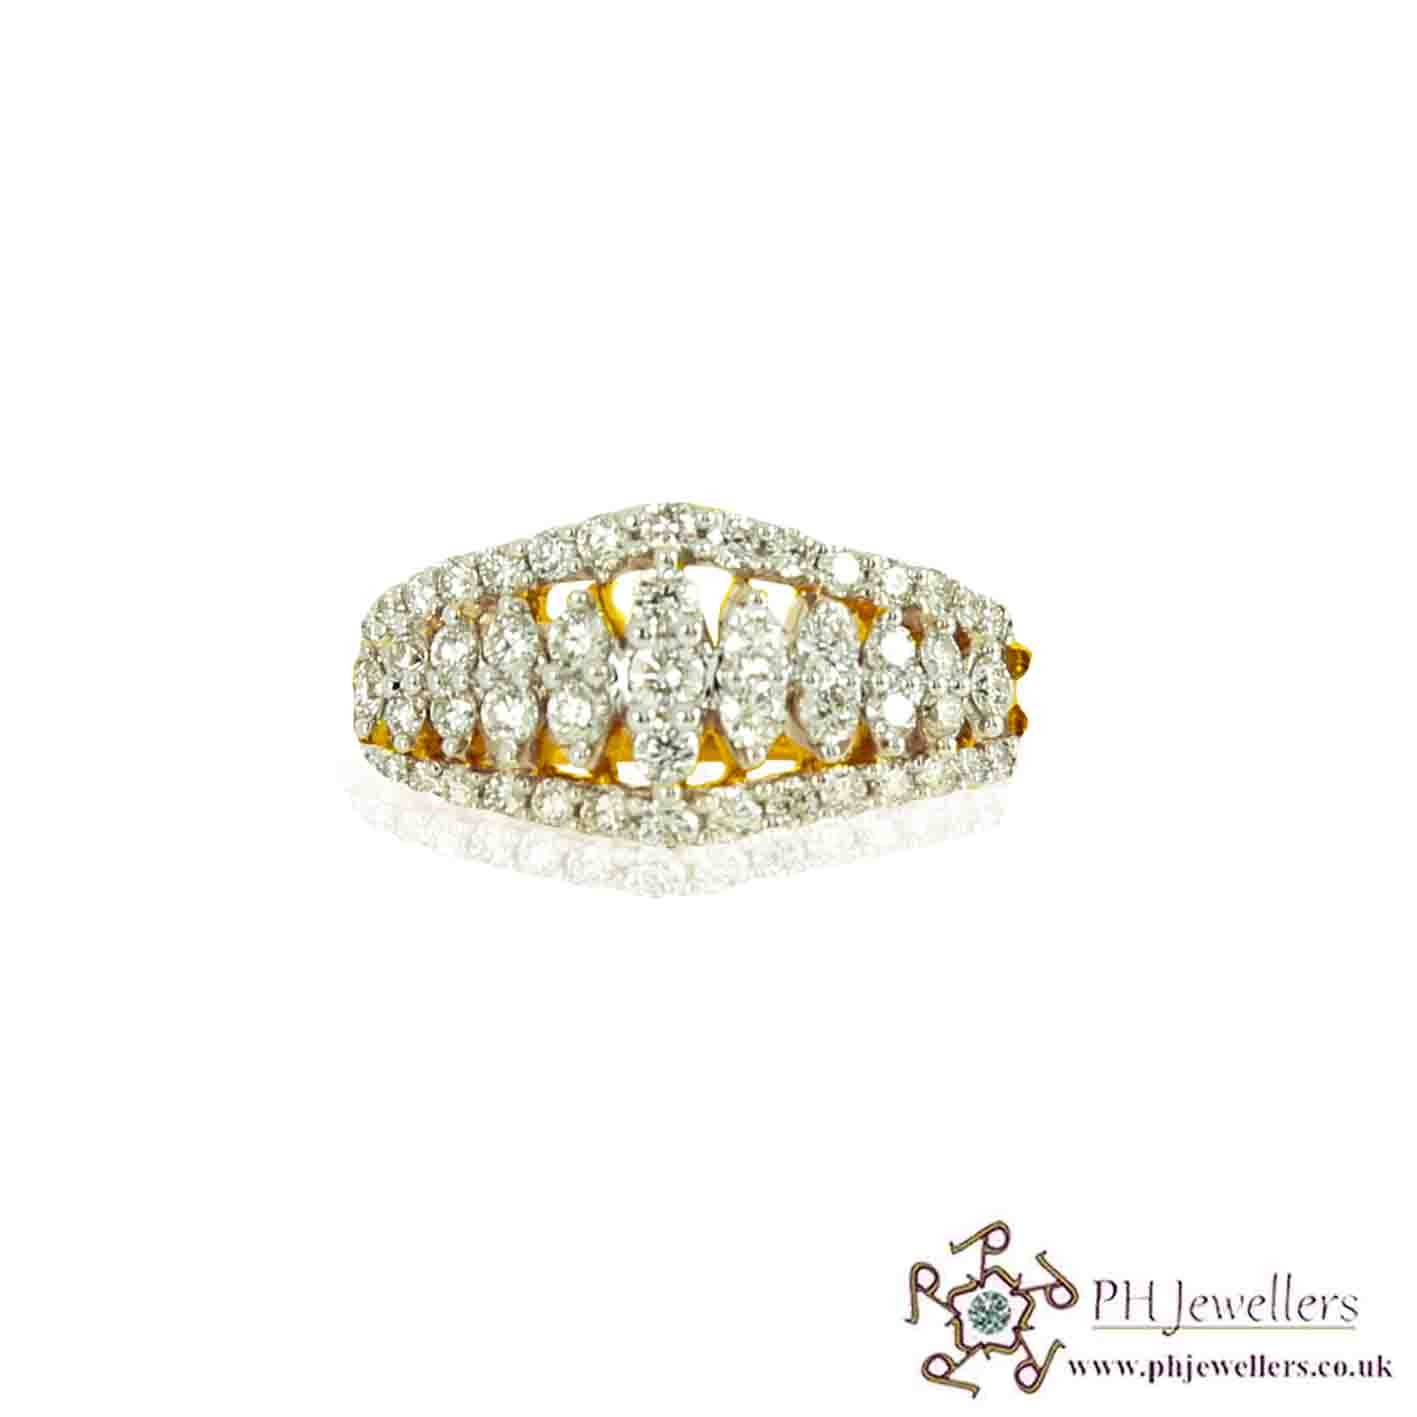 18CT 750 Hallmark Yellow Gold Diamond Size L Ring DR2